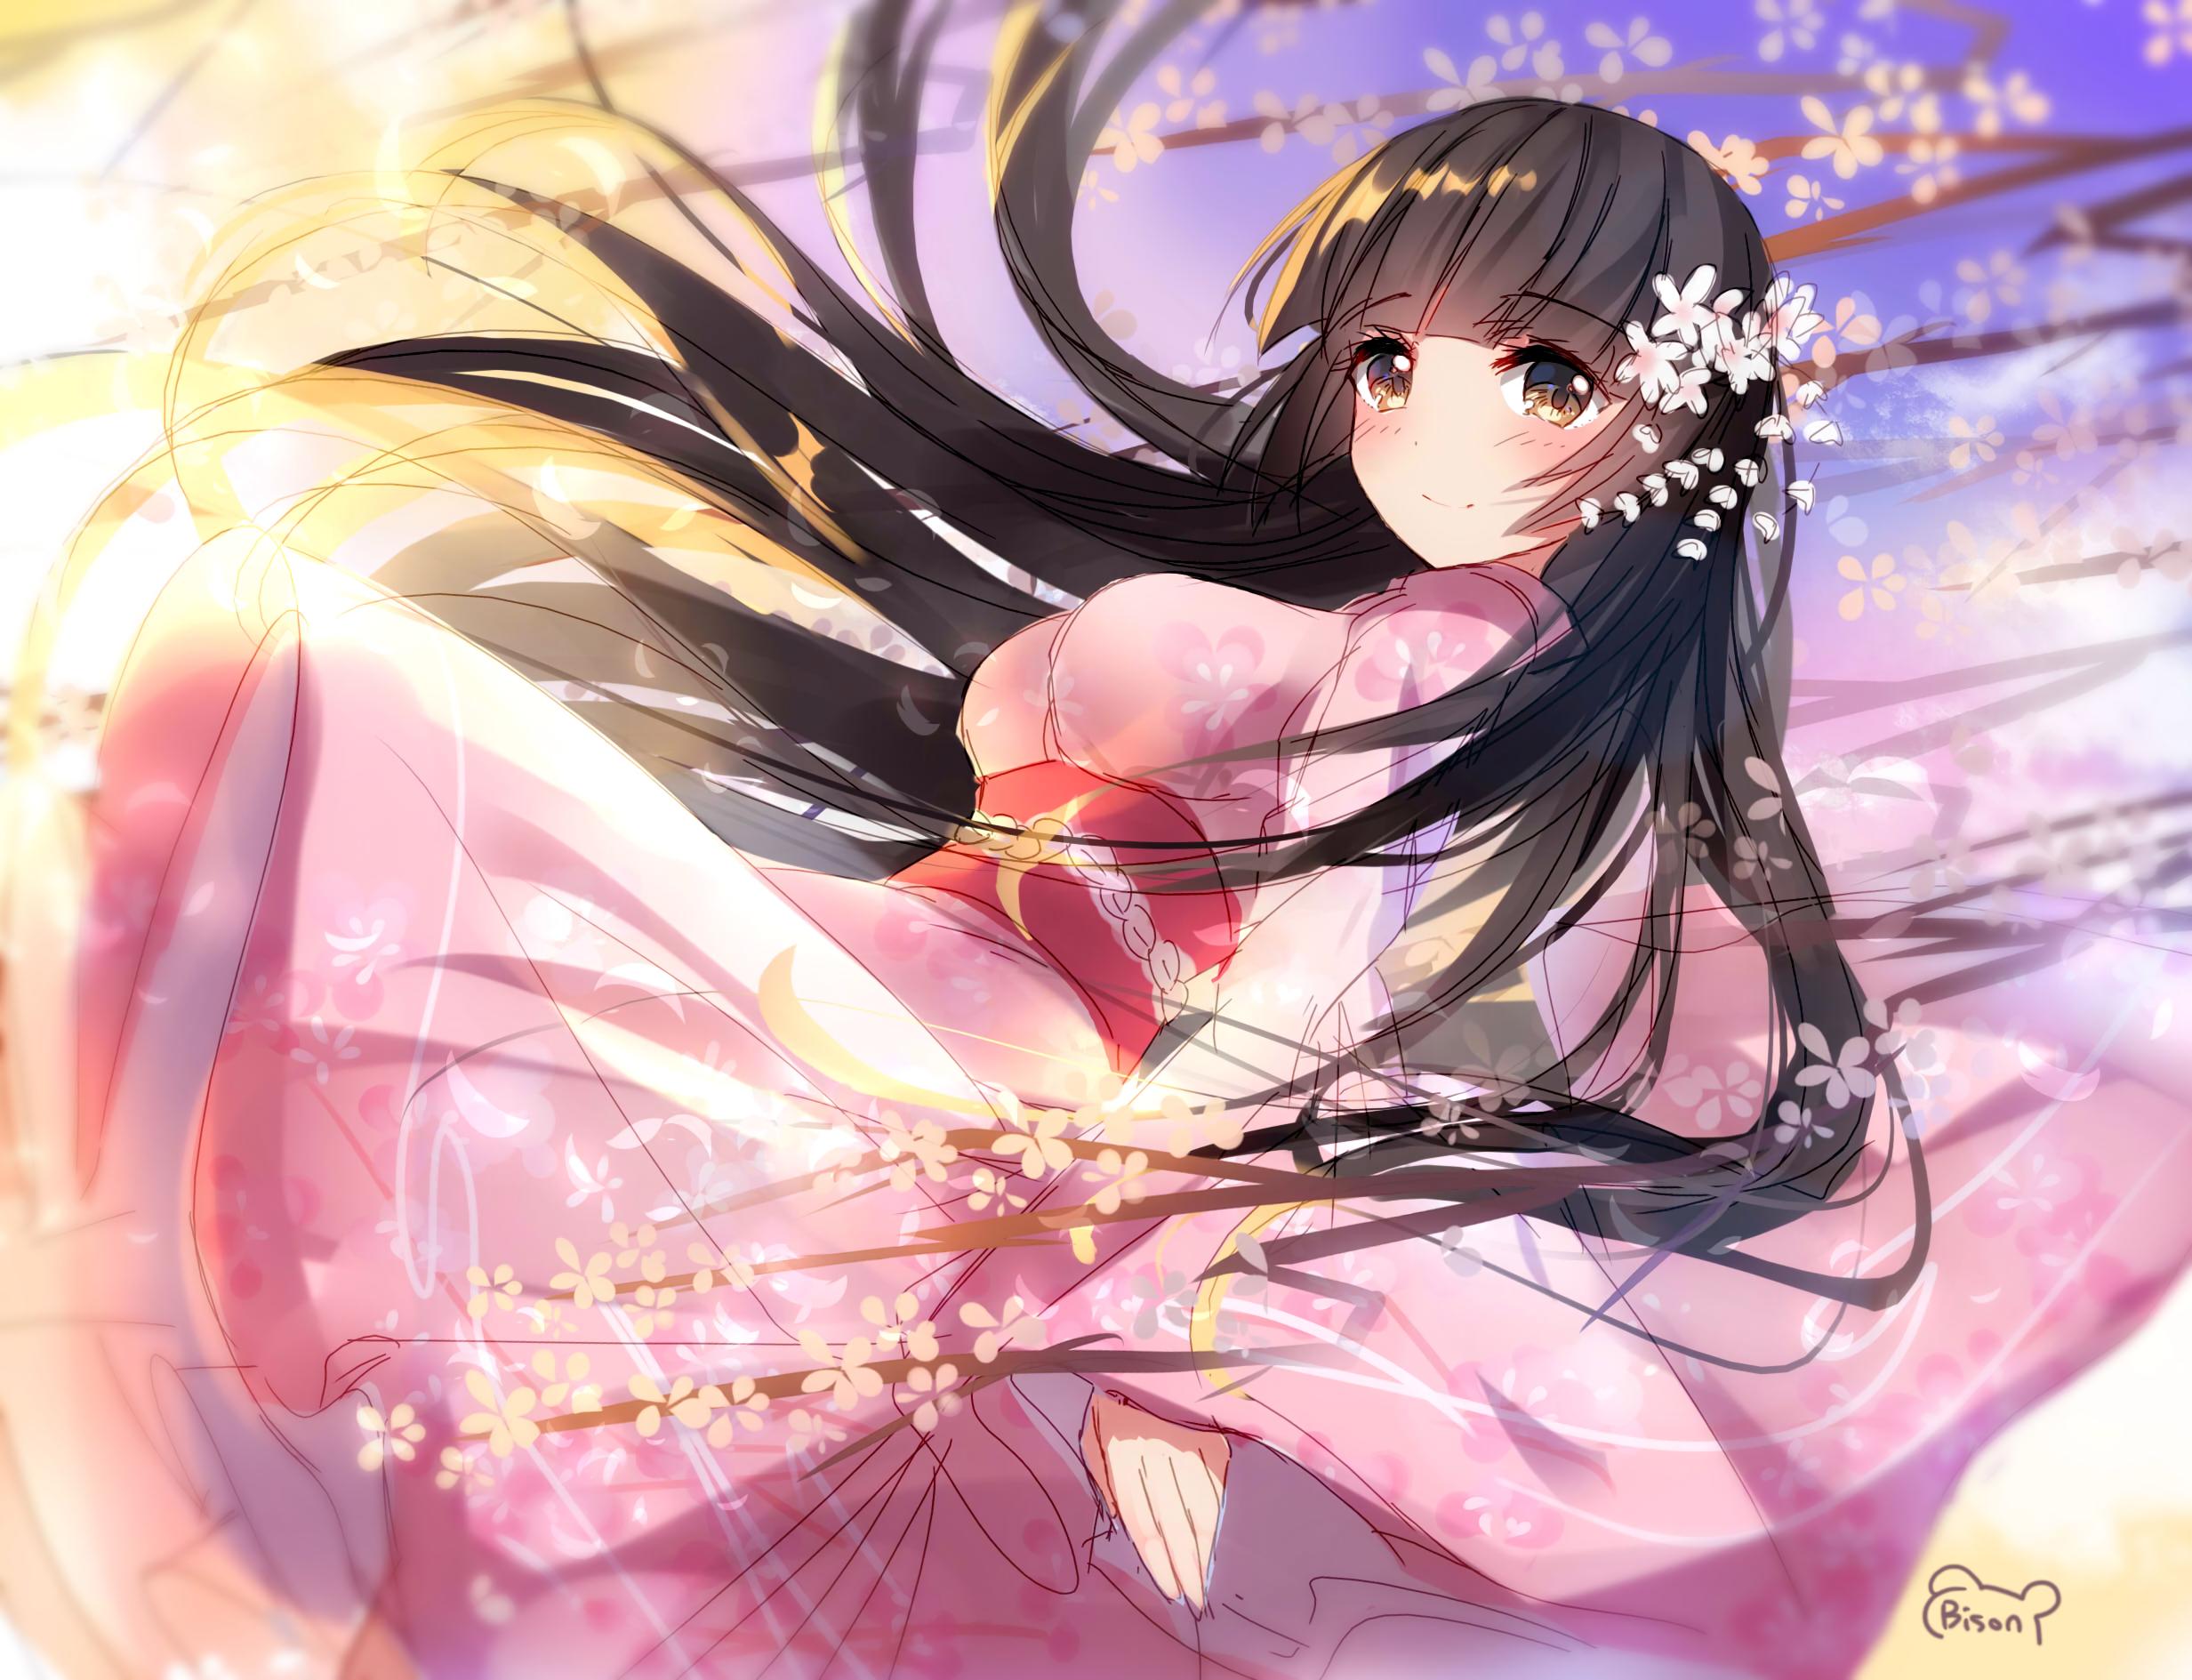 Hd Wallpaper Background Image Id X Anime Warship Girls